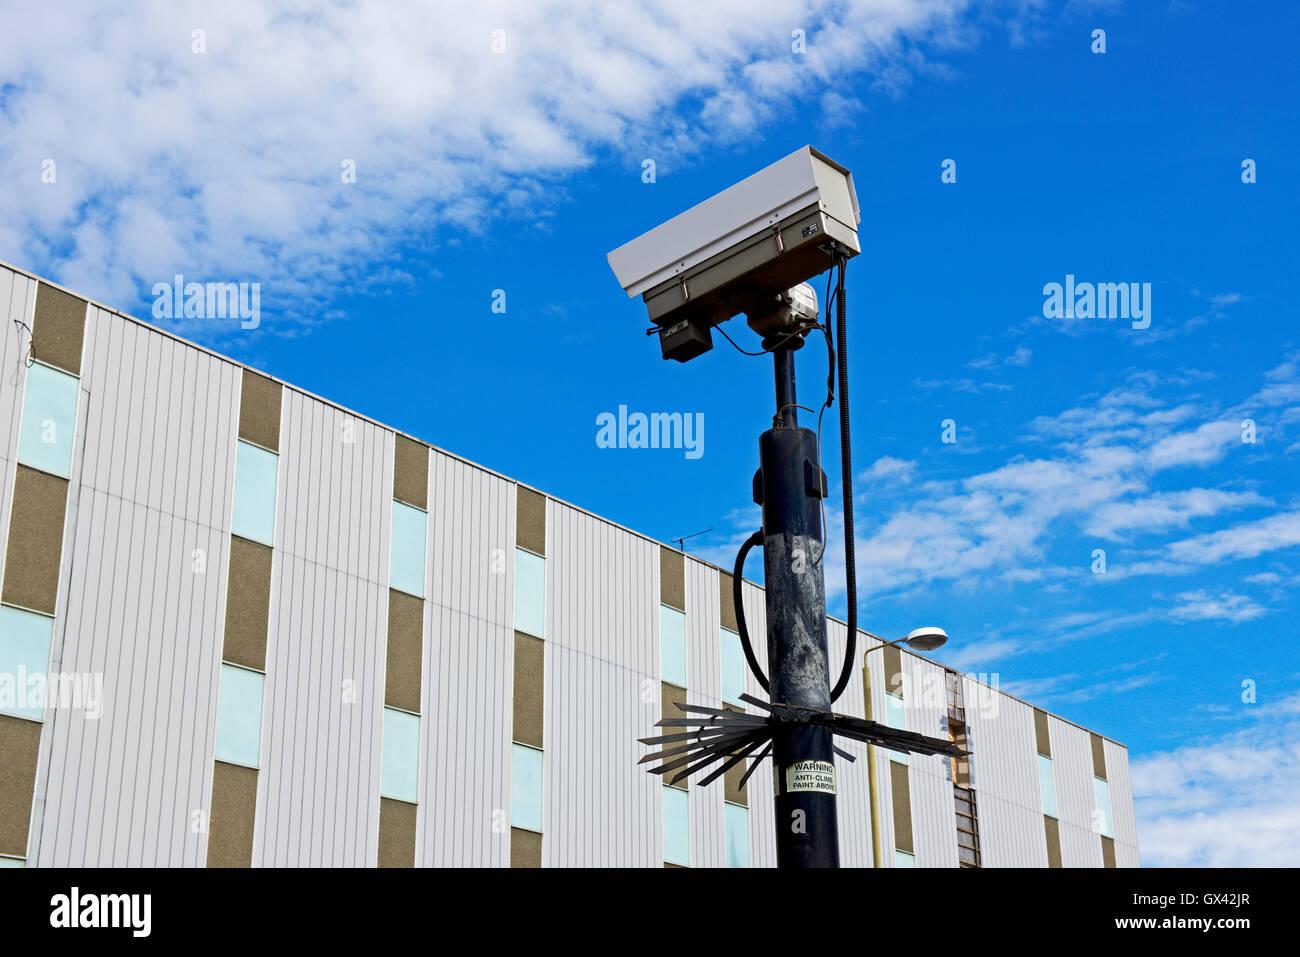 CCTV camera, England UK - Stock Image